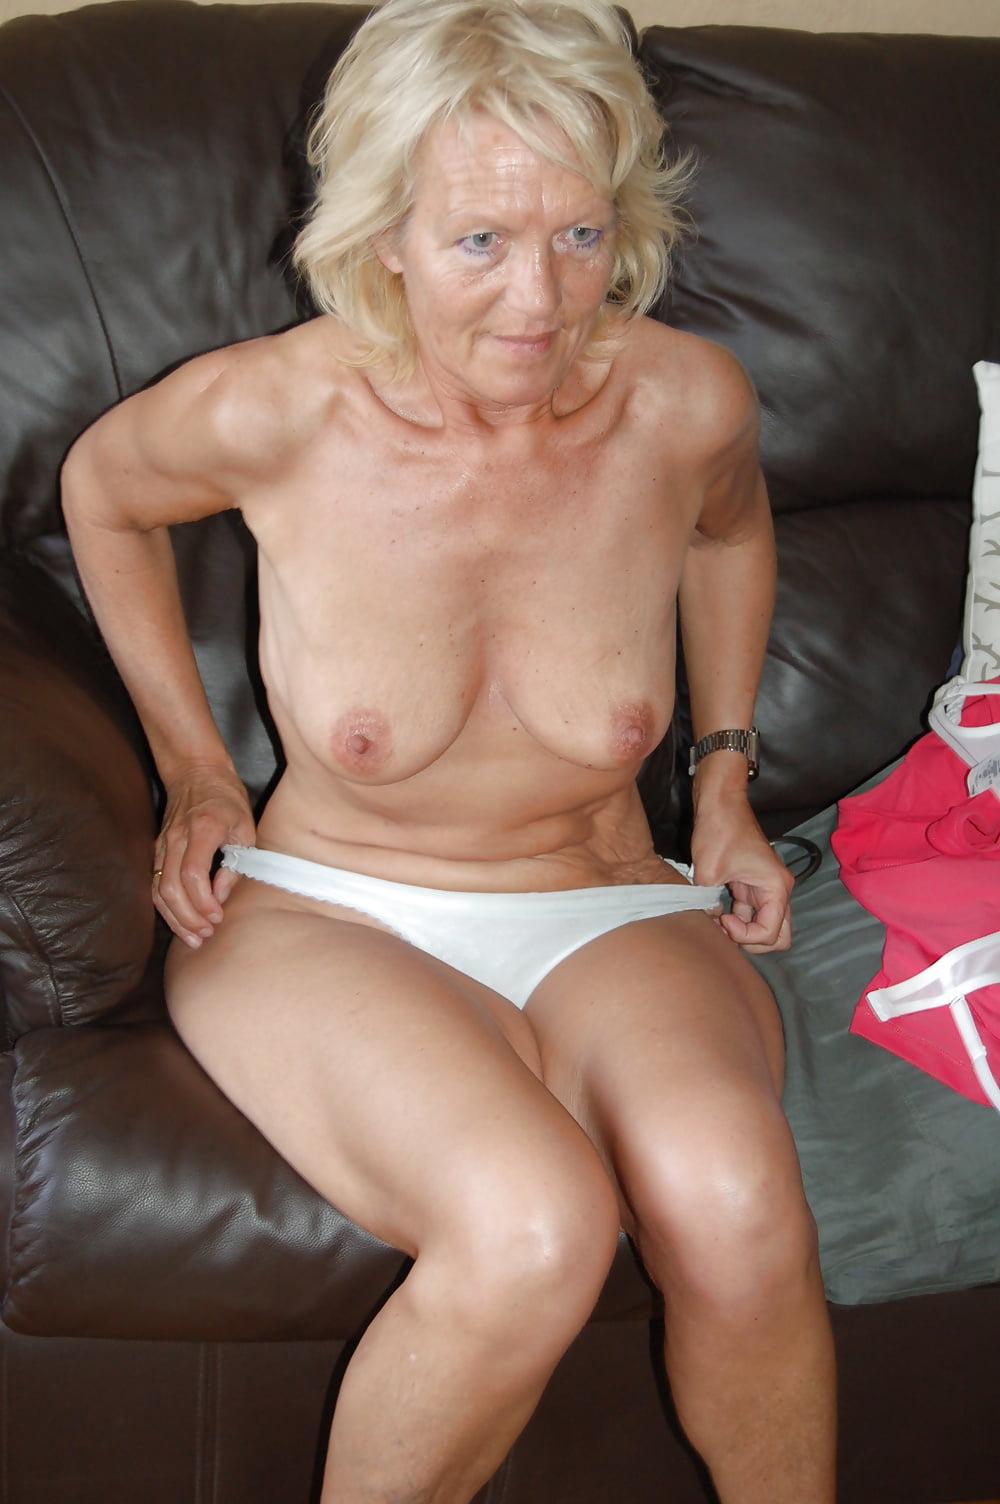 nude-senior-ladies-sexy-flapper-girl-photos